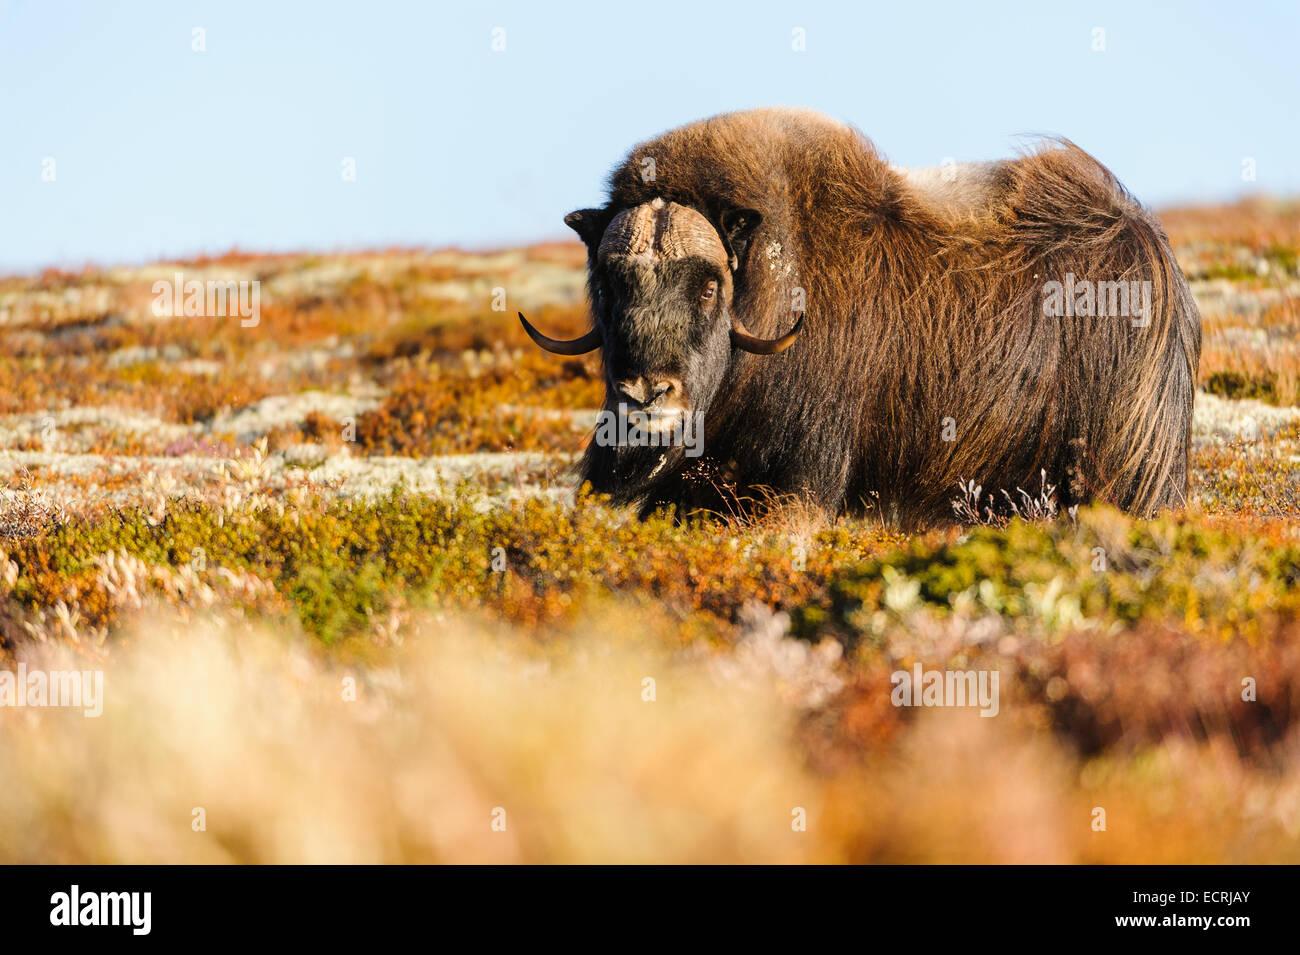 Muskox standing in the Norwegian mountains. - Stock Image